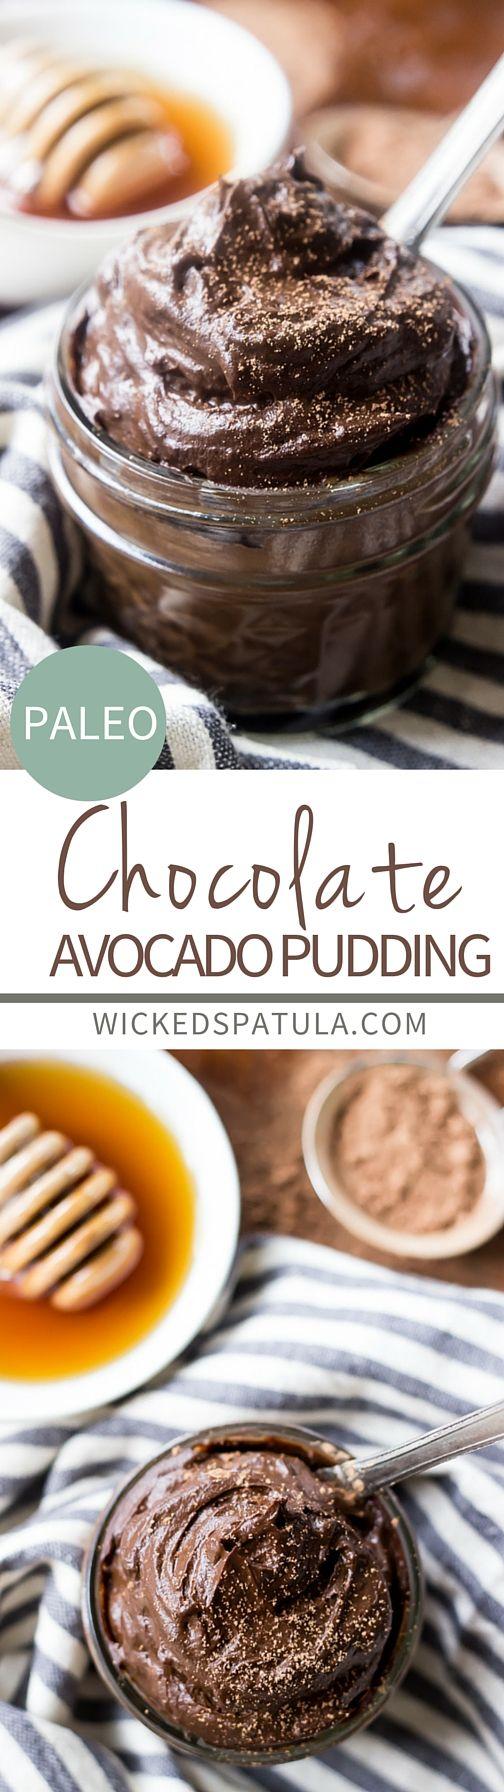 Healthy chocolate avocado mousse recipe #raw #vegan #healthy #dessert #recipe #chocolate #avocado #mousse #pudding